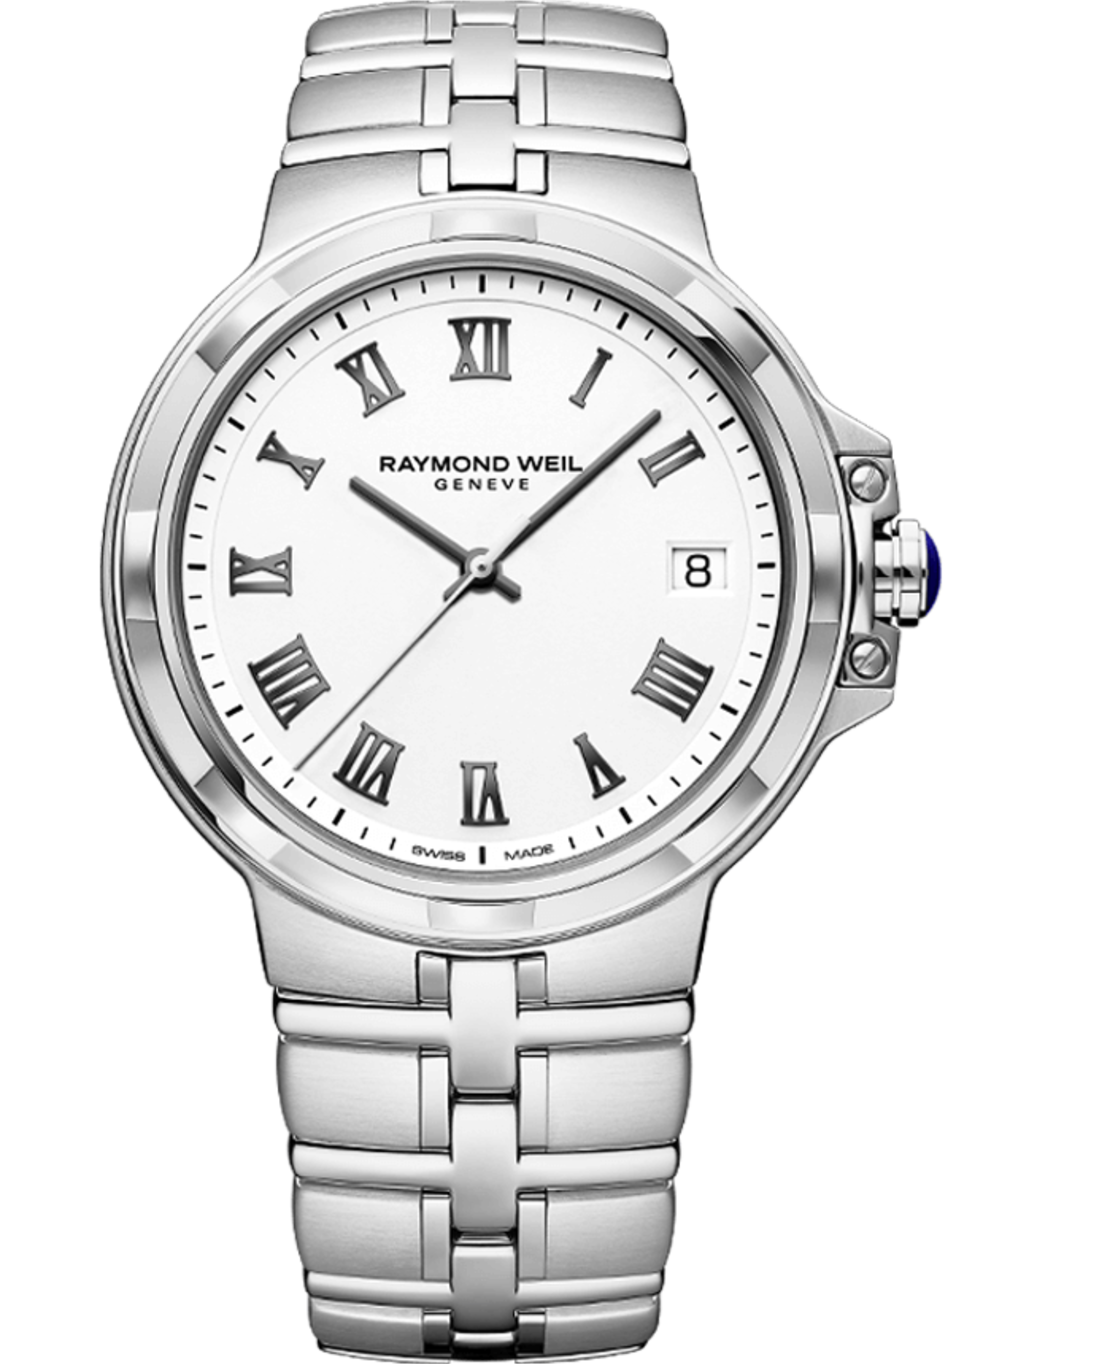 5580-ST-00300 Parsifal Men's Quartz Classic Silver